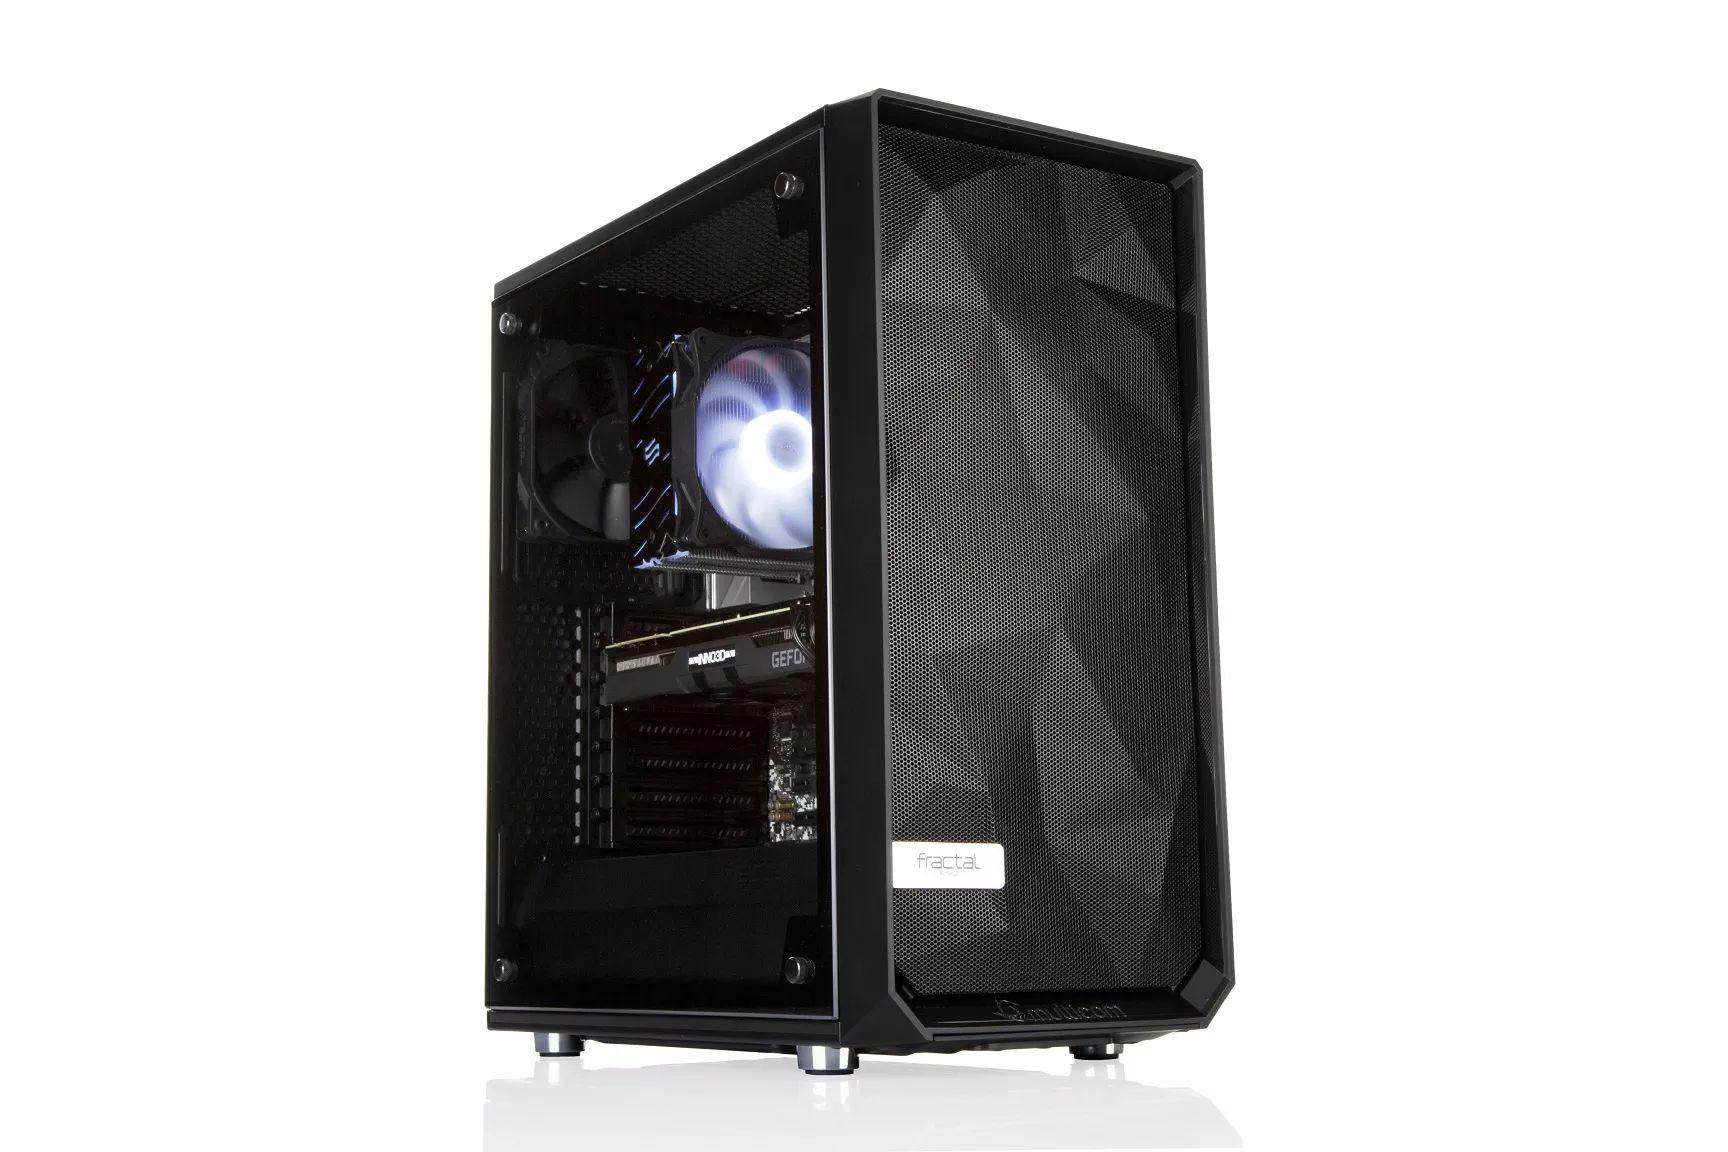 Multicom A824R Gaming PC